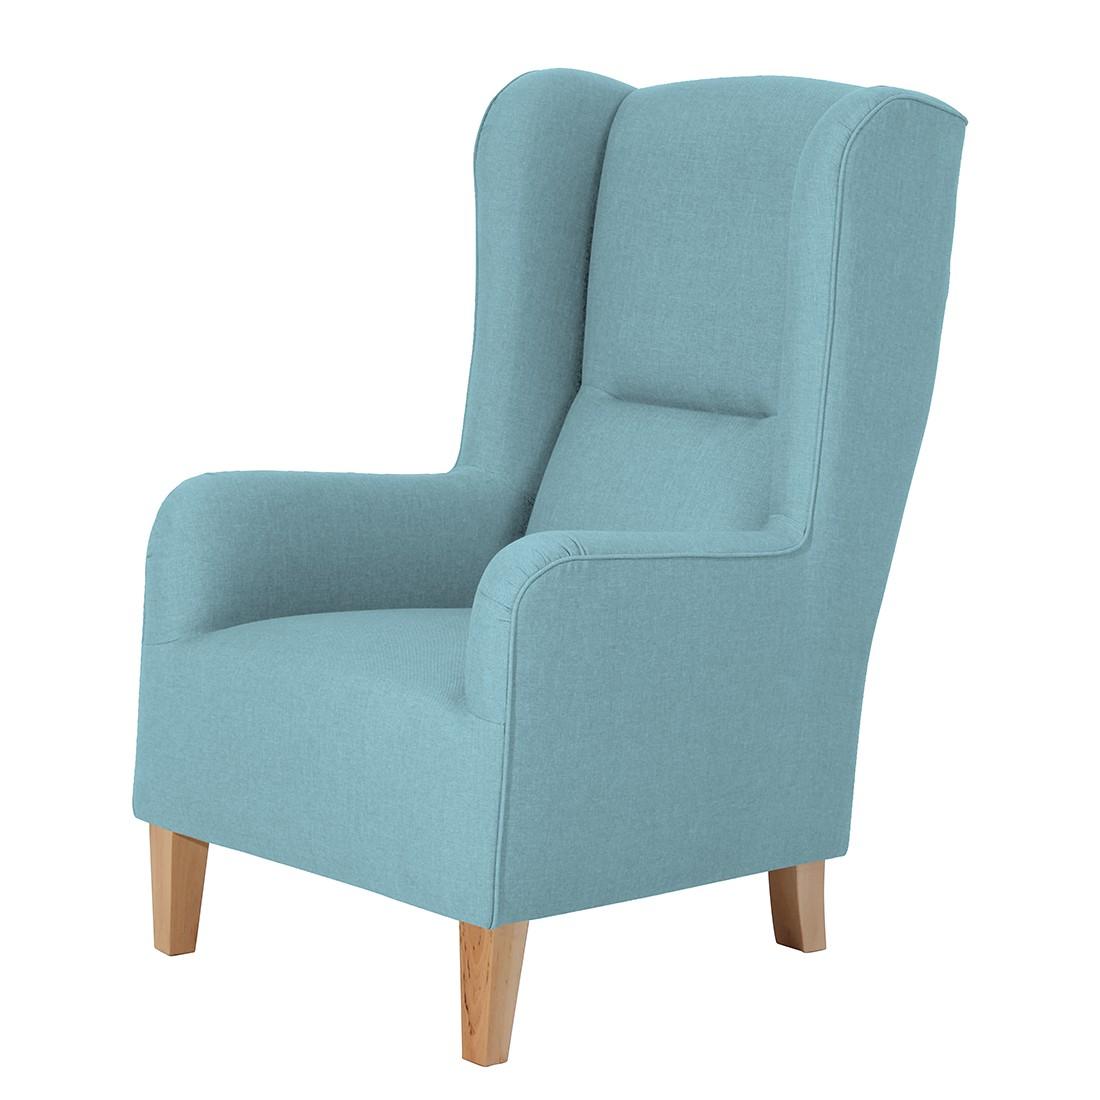 ohrensessel online kaufen m bel suchmaschine. Black Bedroom Furniture Sets. Home Design Ideas